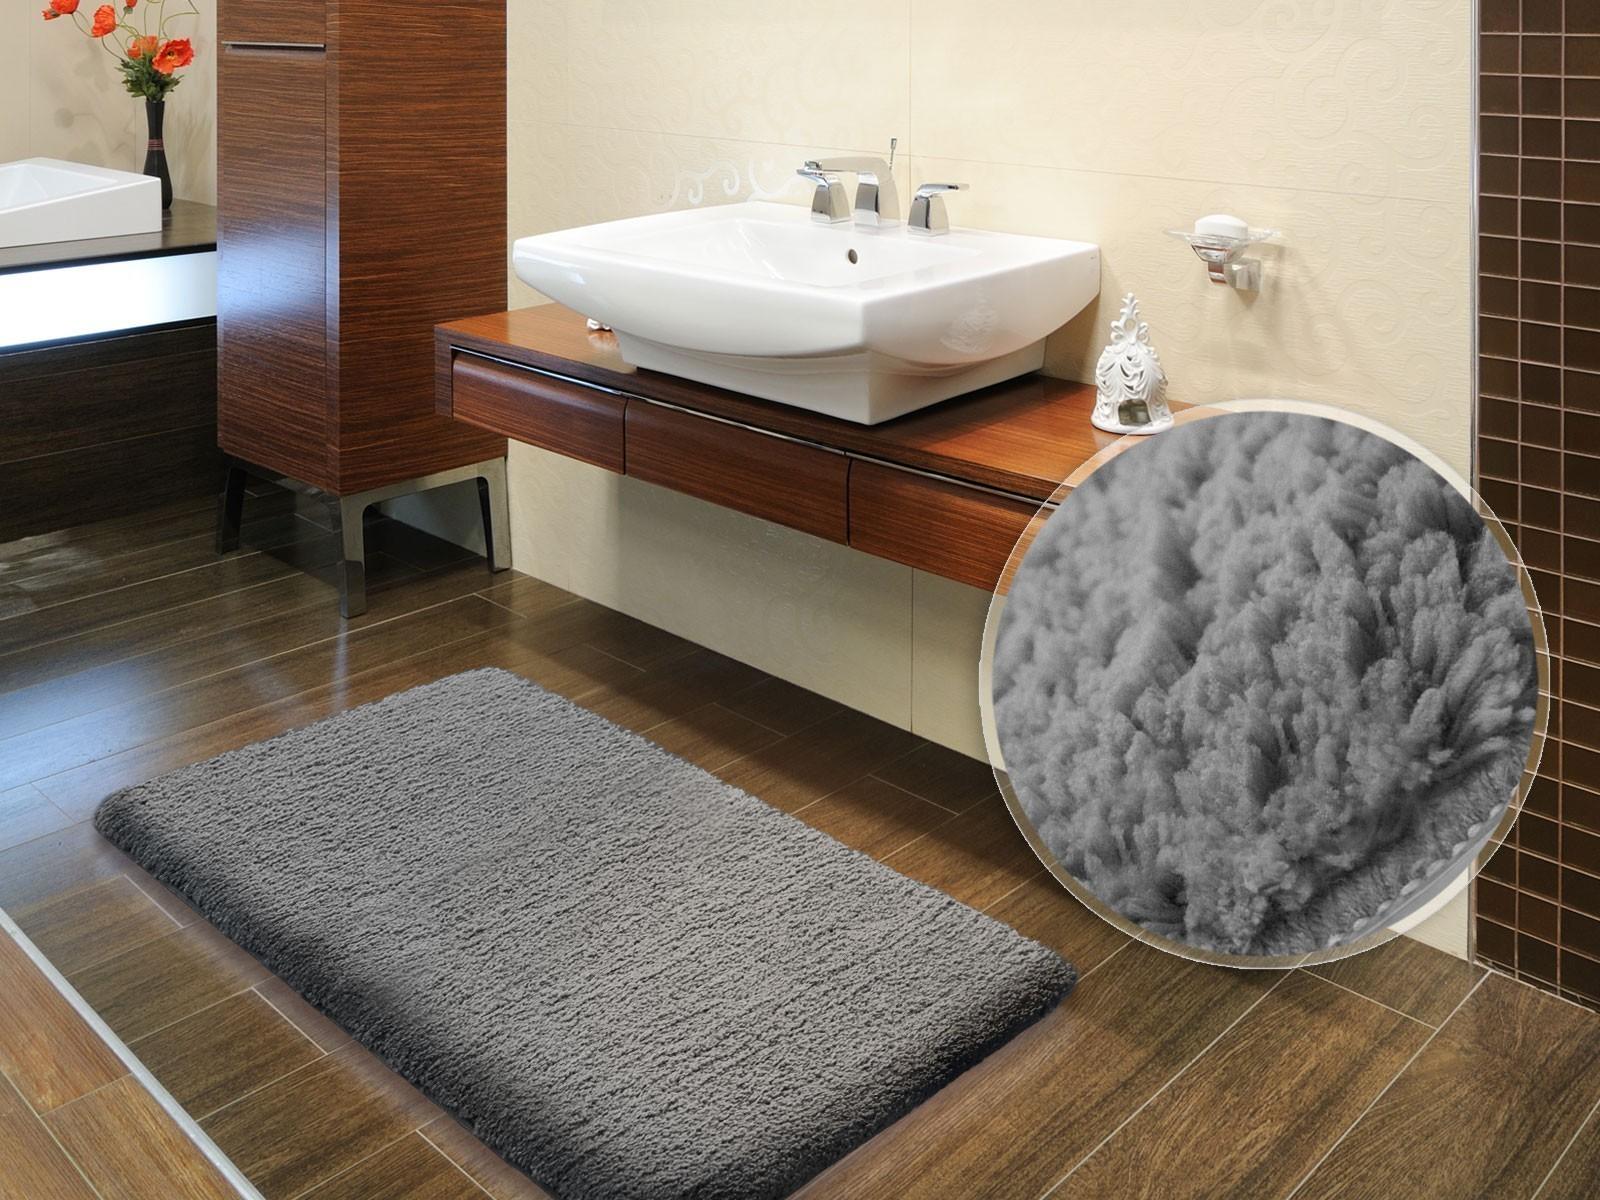 Best Of 3x5 Bathroom Rugs Online Bathroom Design Ideas Gallery